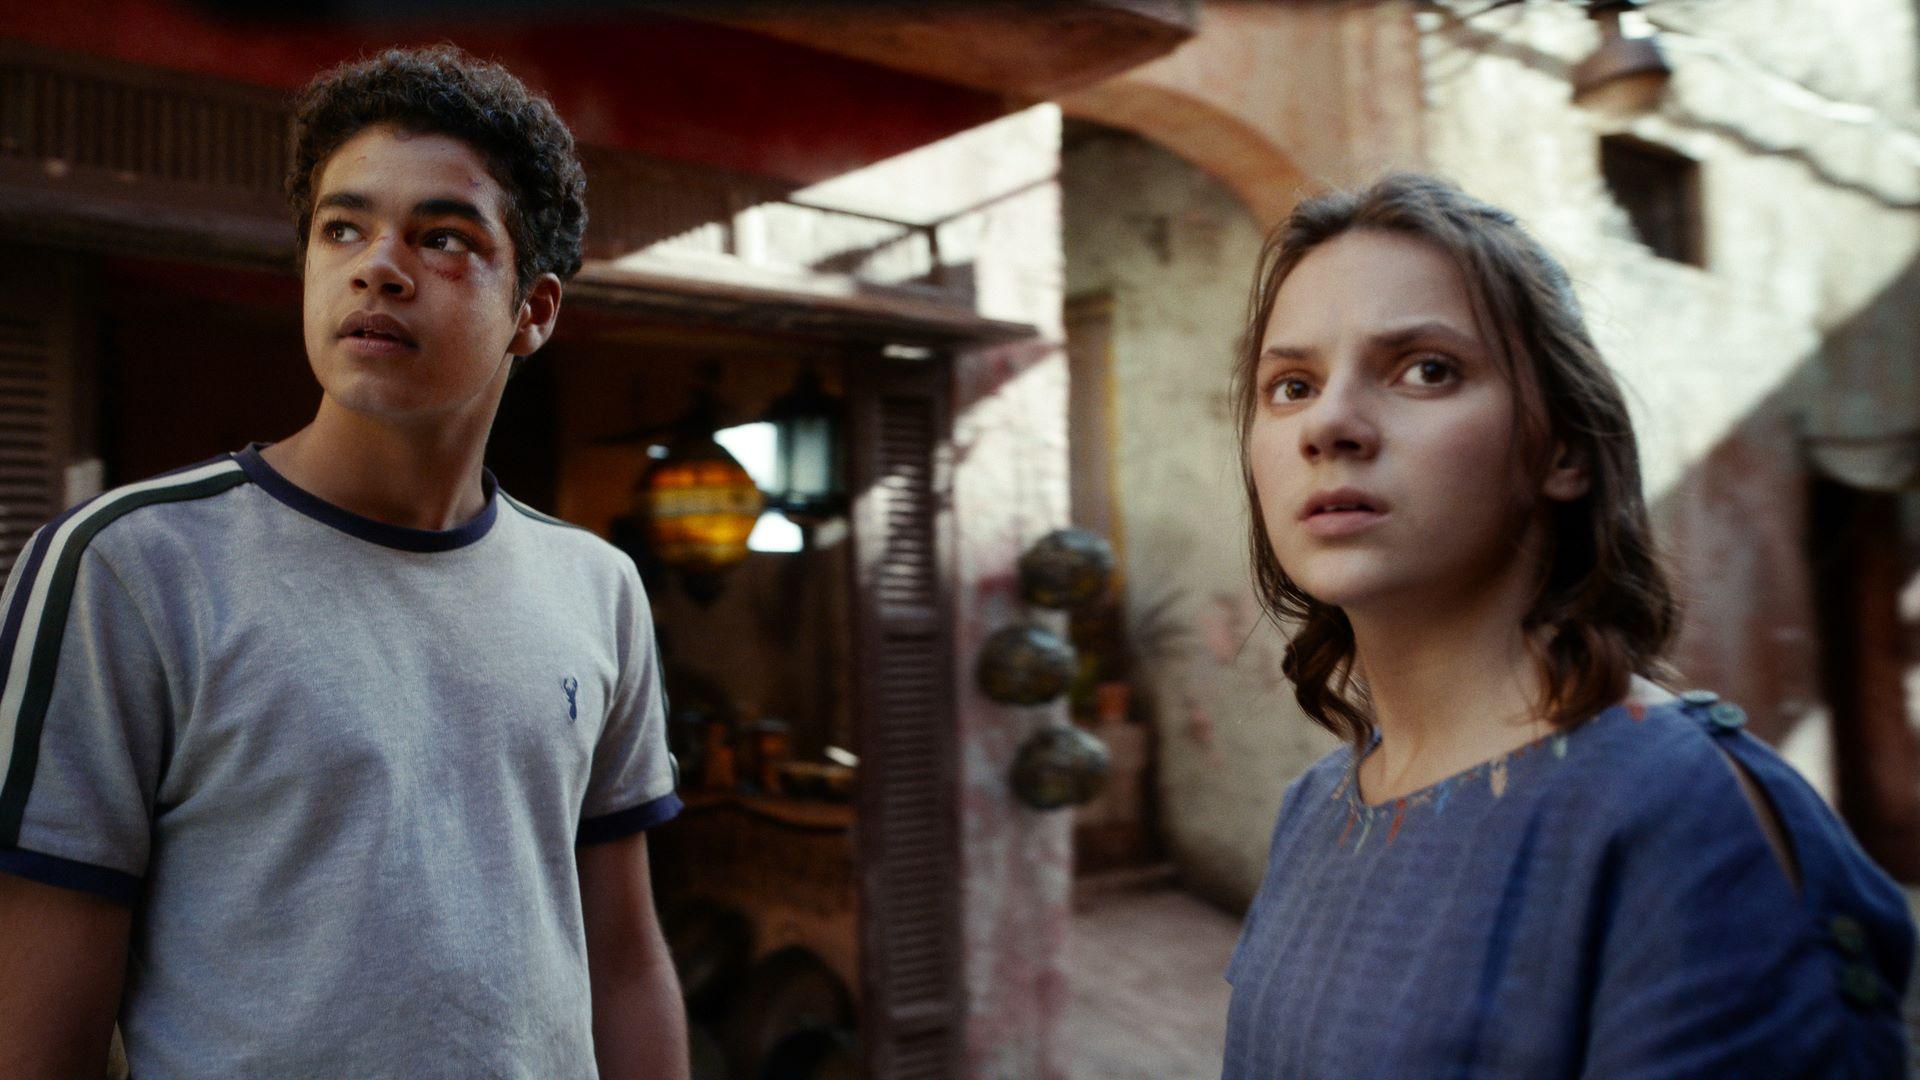 Amir Wilson and Dafne Keen in 'His Dark Materials'